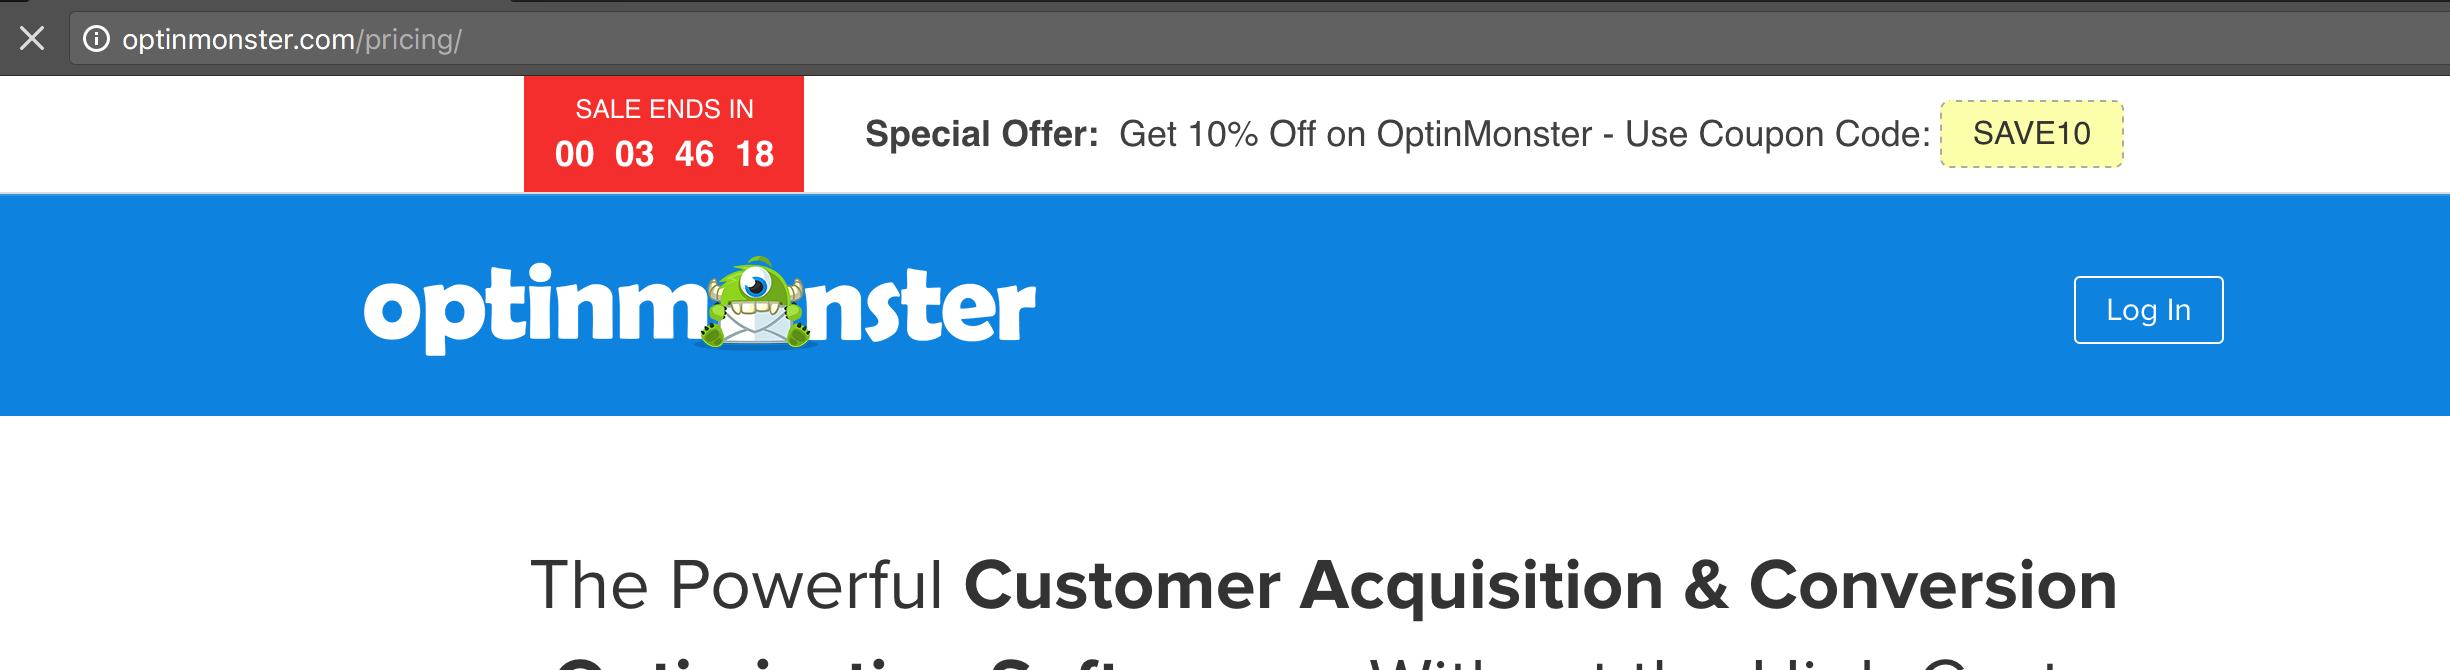 OptinMonster's Countdown Timer